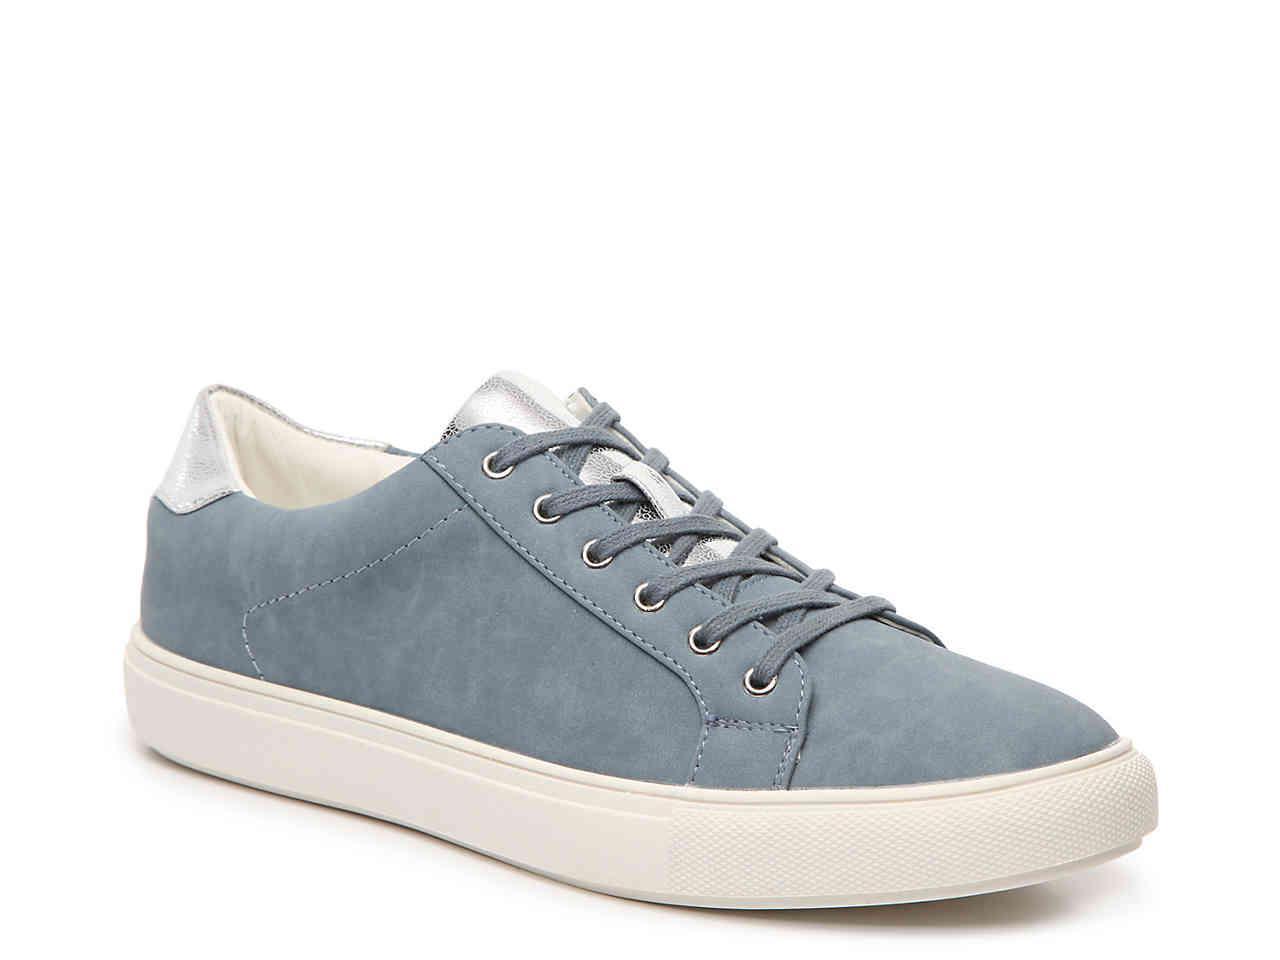 Hartley Dick blass shoes